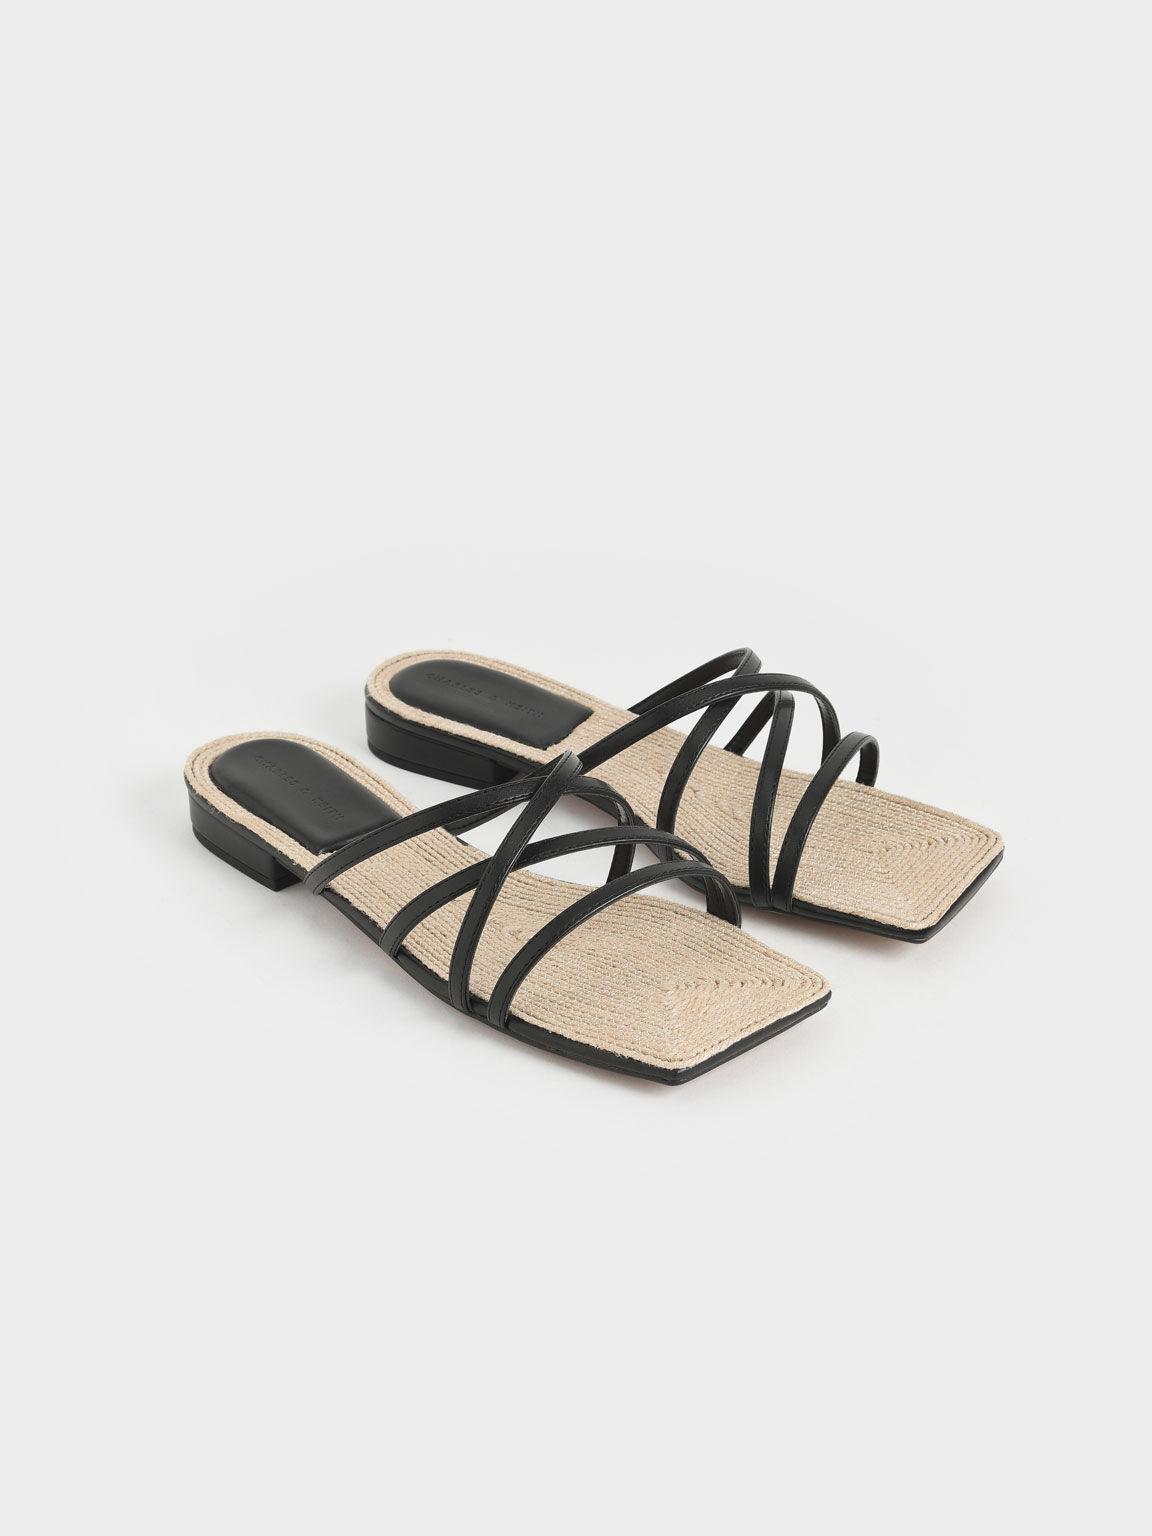 Strappy Square Toe Sandals, Black, hi-res